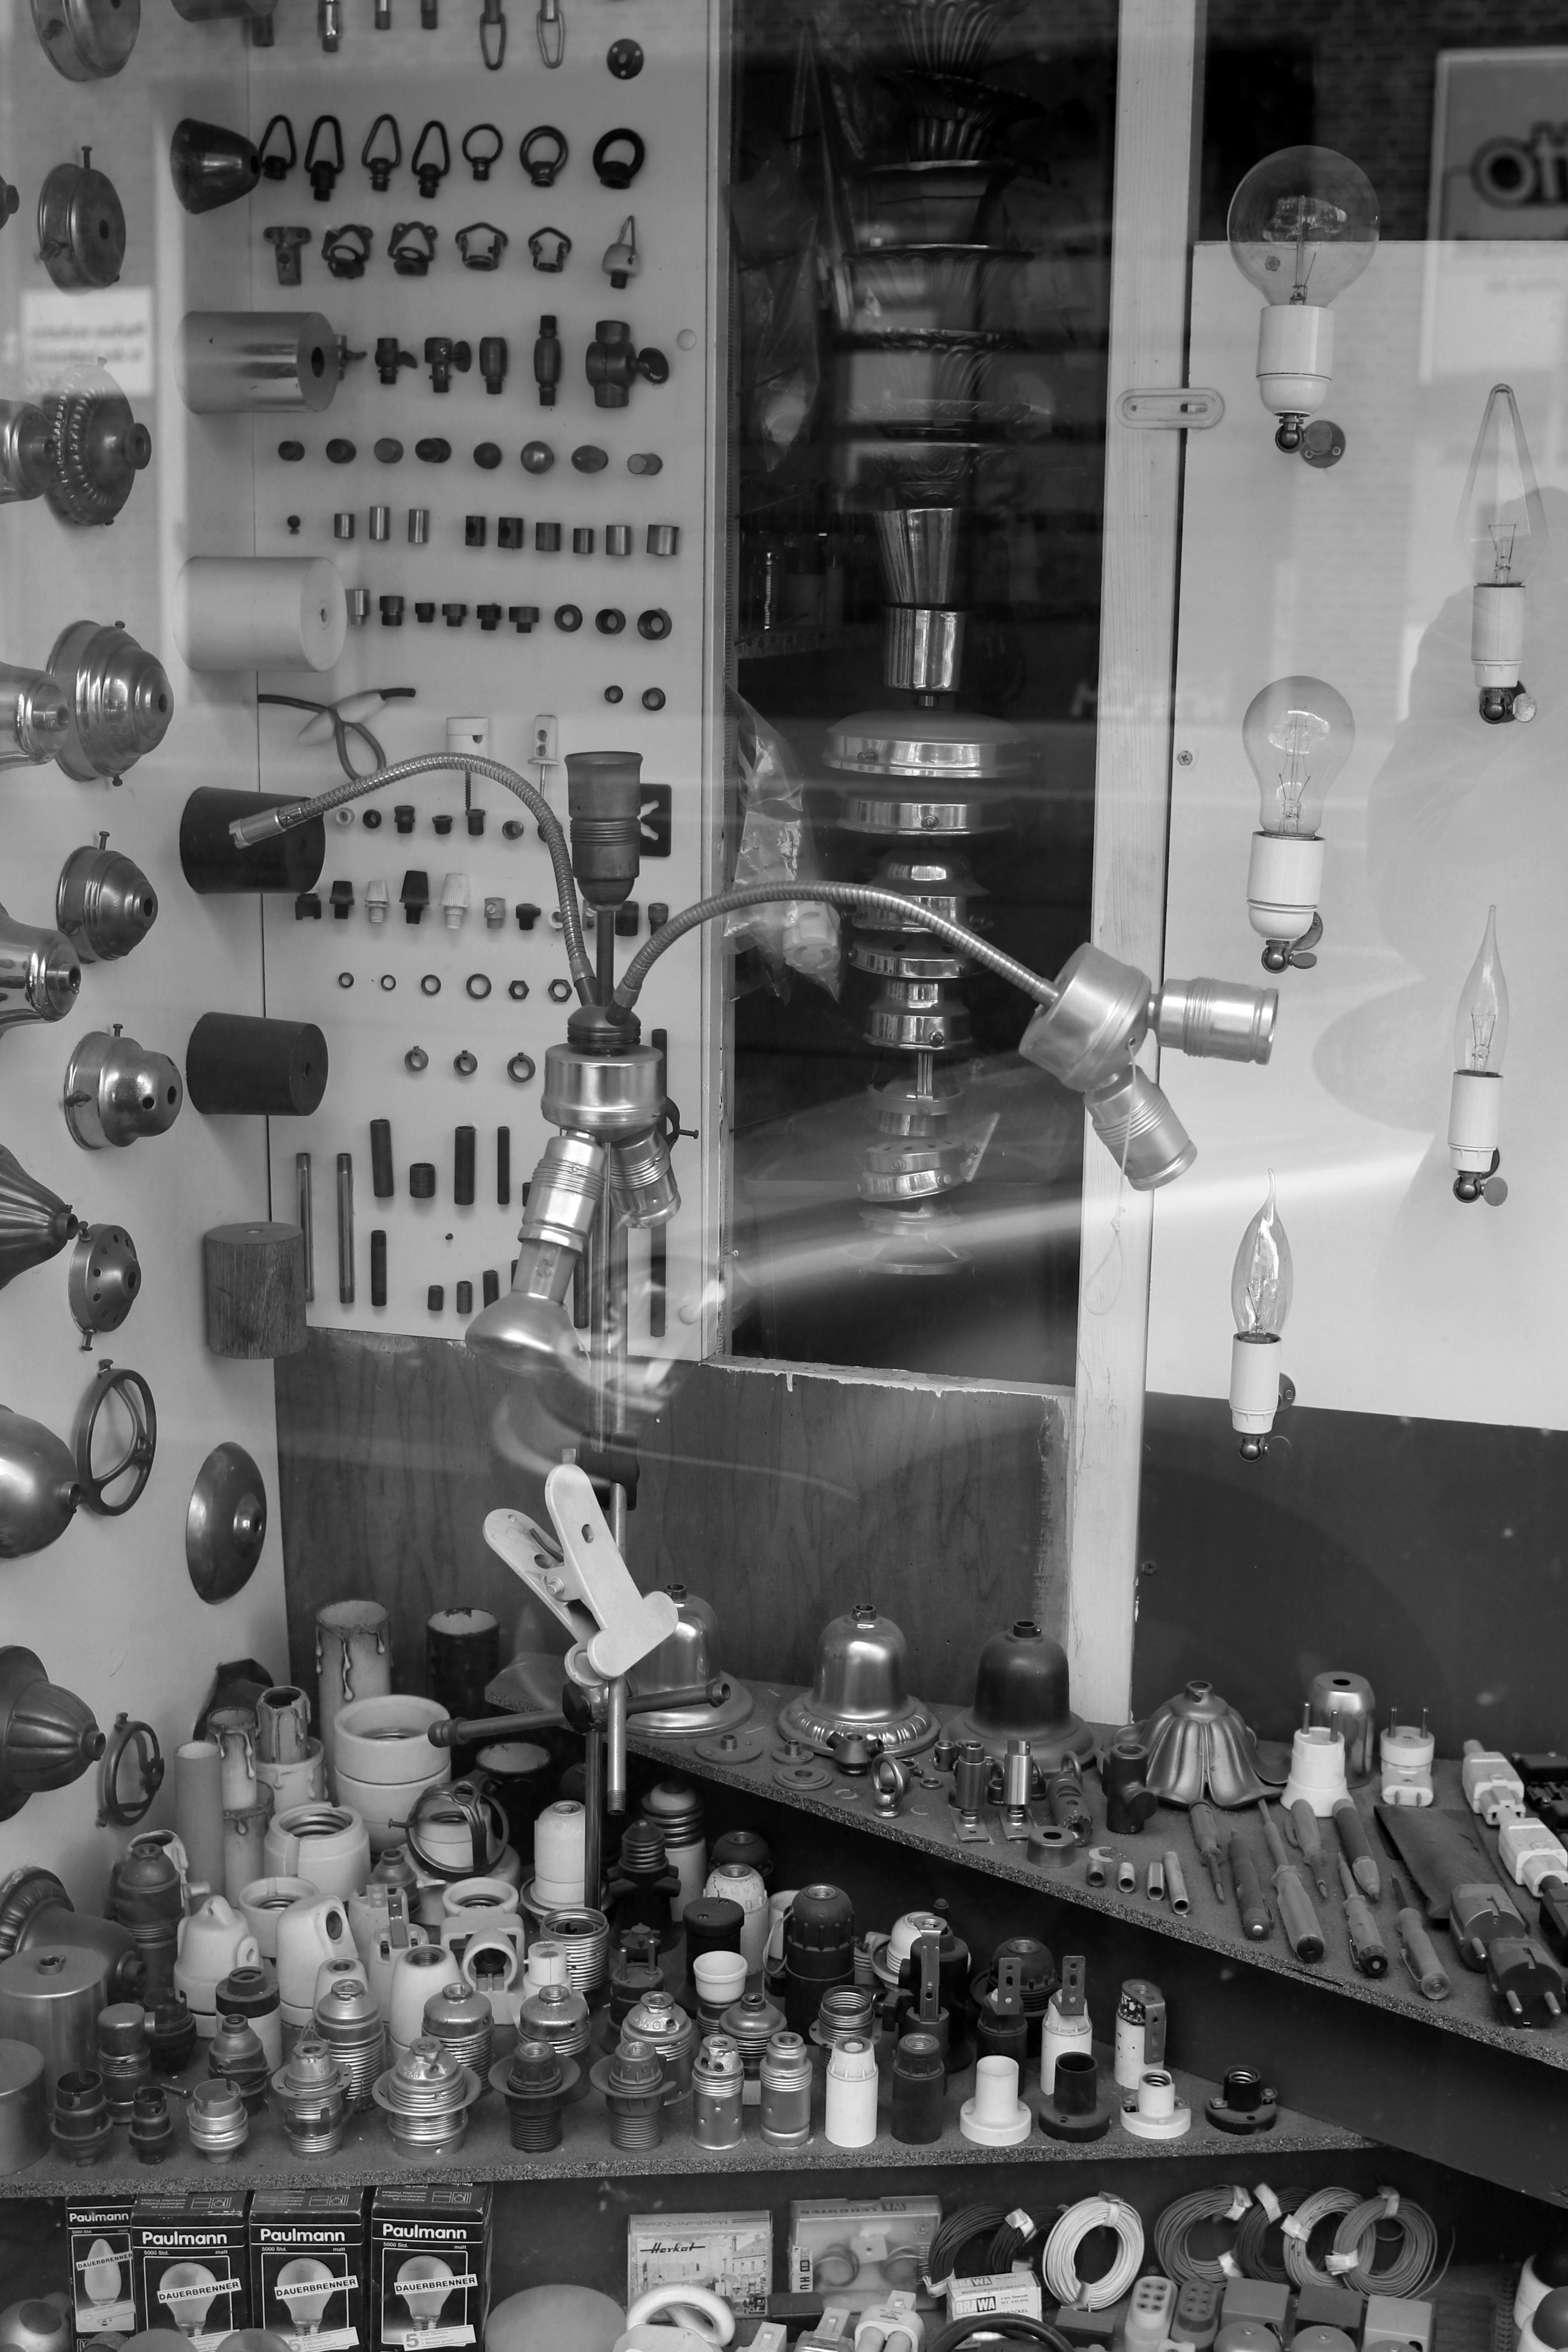 black-and-white-white-photography-bulb-lamp-black-monochrome-bw-blackandwhite-blackwhite-bulbs-photograph-lamps-germany-alemania-allemagne-sw-schwarzweiss-schwarzweis-image-frankfurtmain-frankfurtammain-frankfurtam-frankfurtamain-germania-frankfurt-schwarzweissfotografie-schwarzweisfotografie-electro-lampen-elektrik-elektro-glhbirnen-elektroartikel-elektrobauteile-elektrikbauteile-monochrome-photography-240896 Spannende Lampen Frankfurt Am Main Dekorationen